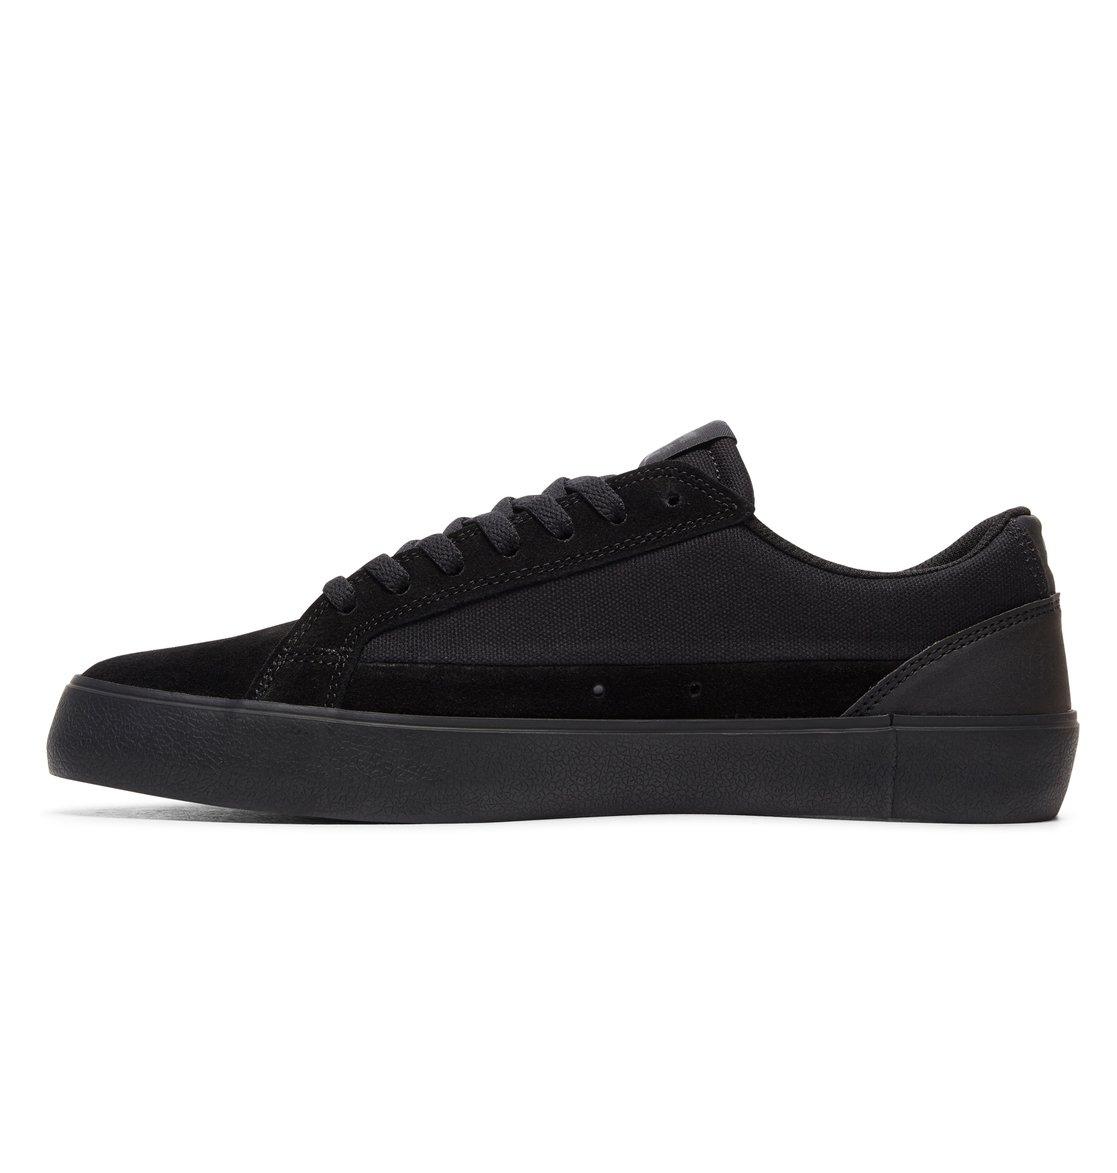 Lynnfield S - Chaussures de skate - Noir - DC Shoes uFgsLBOyD